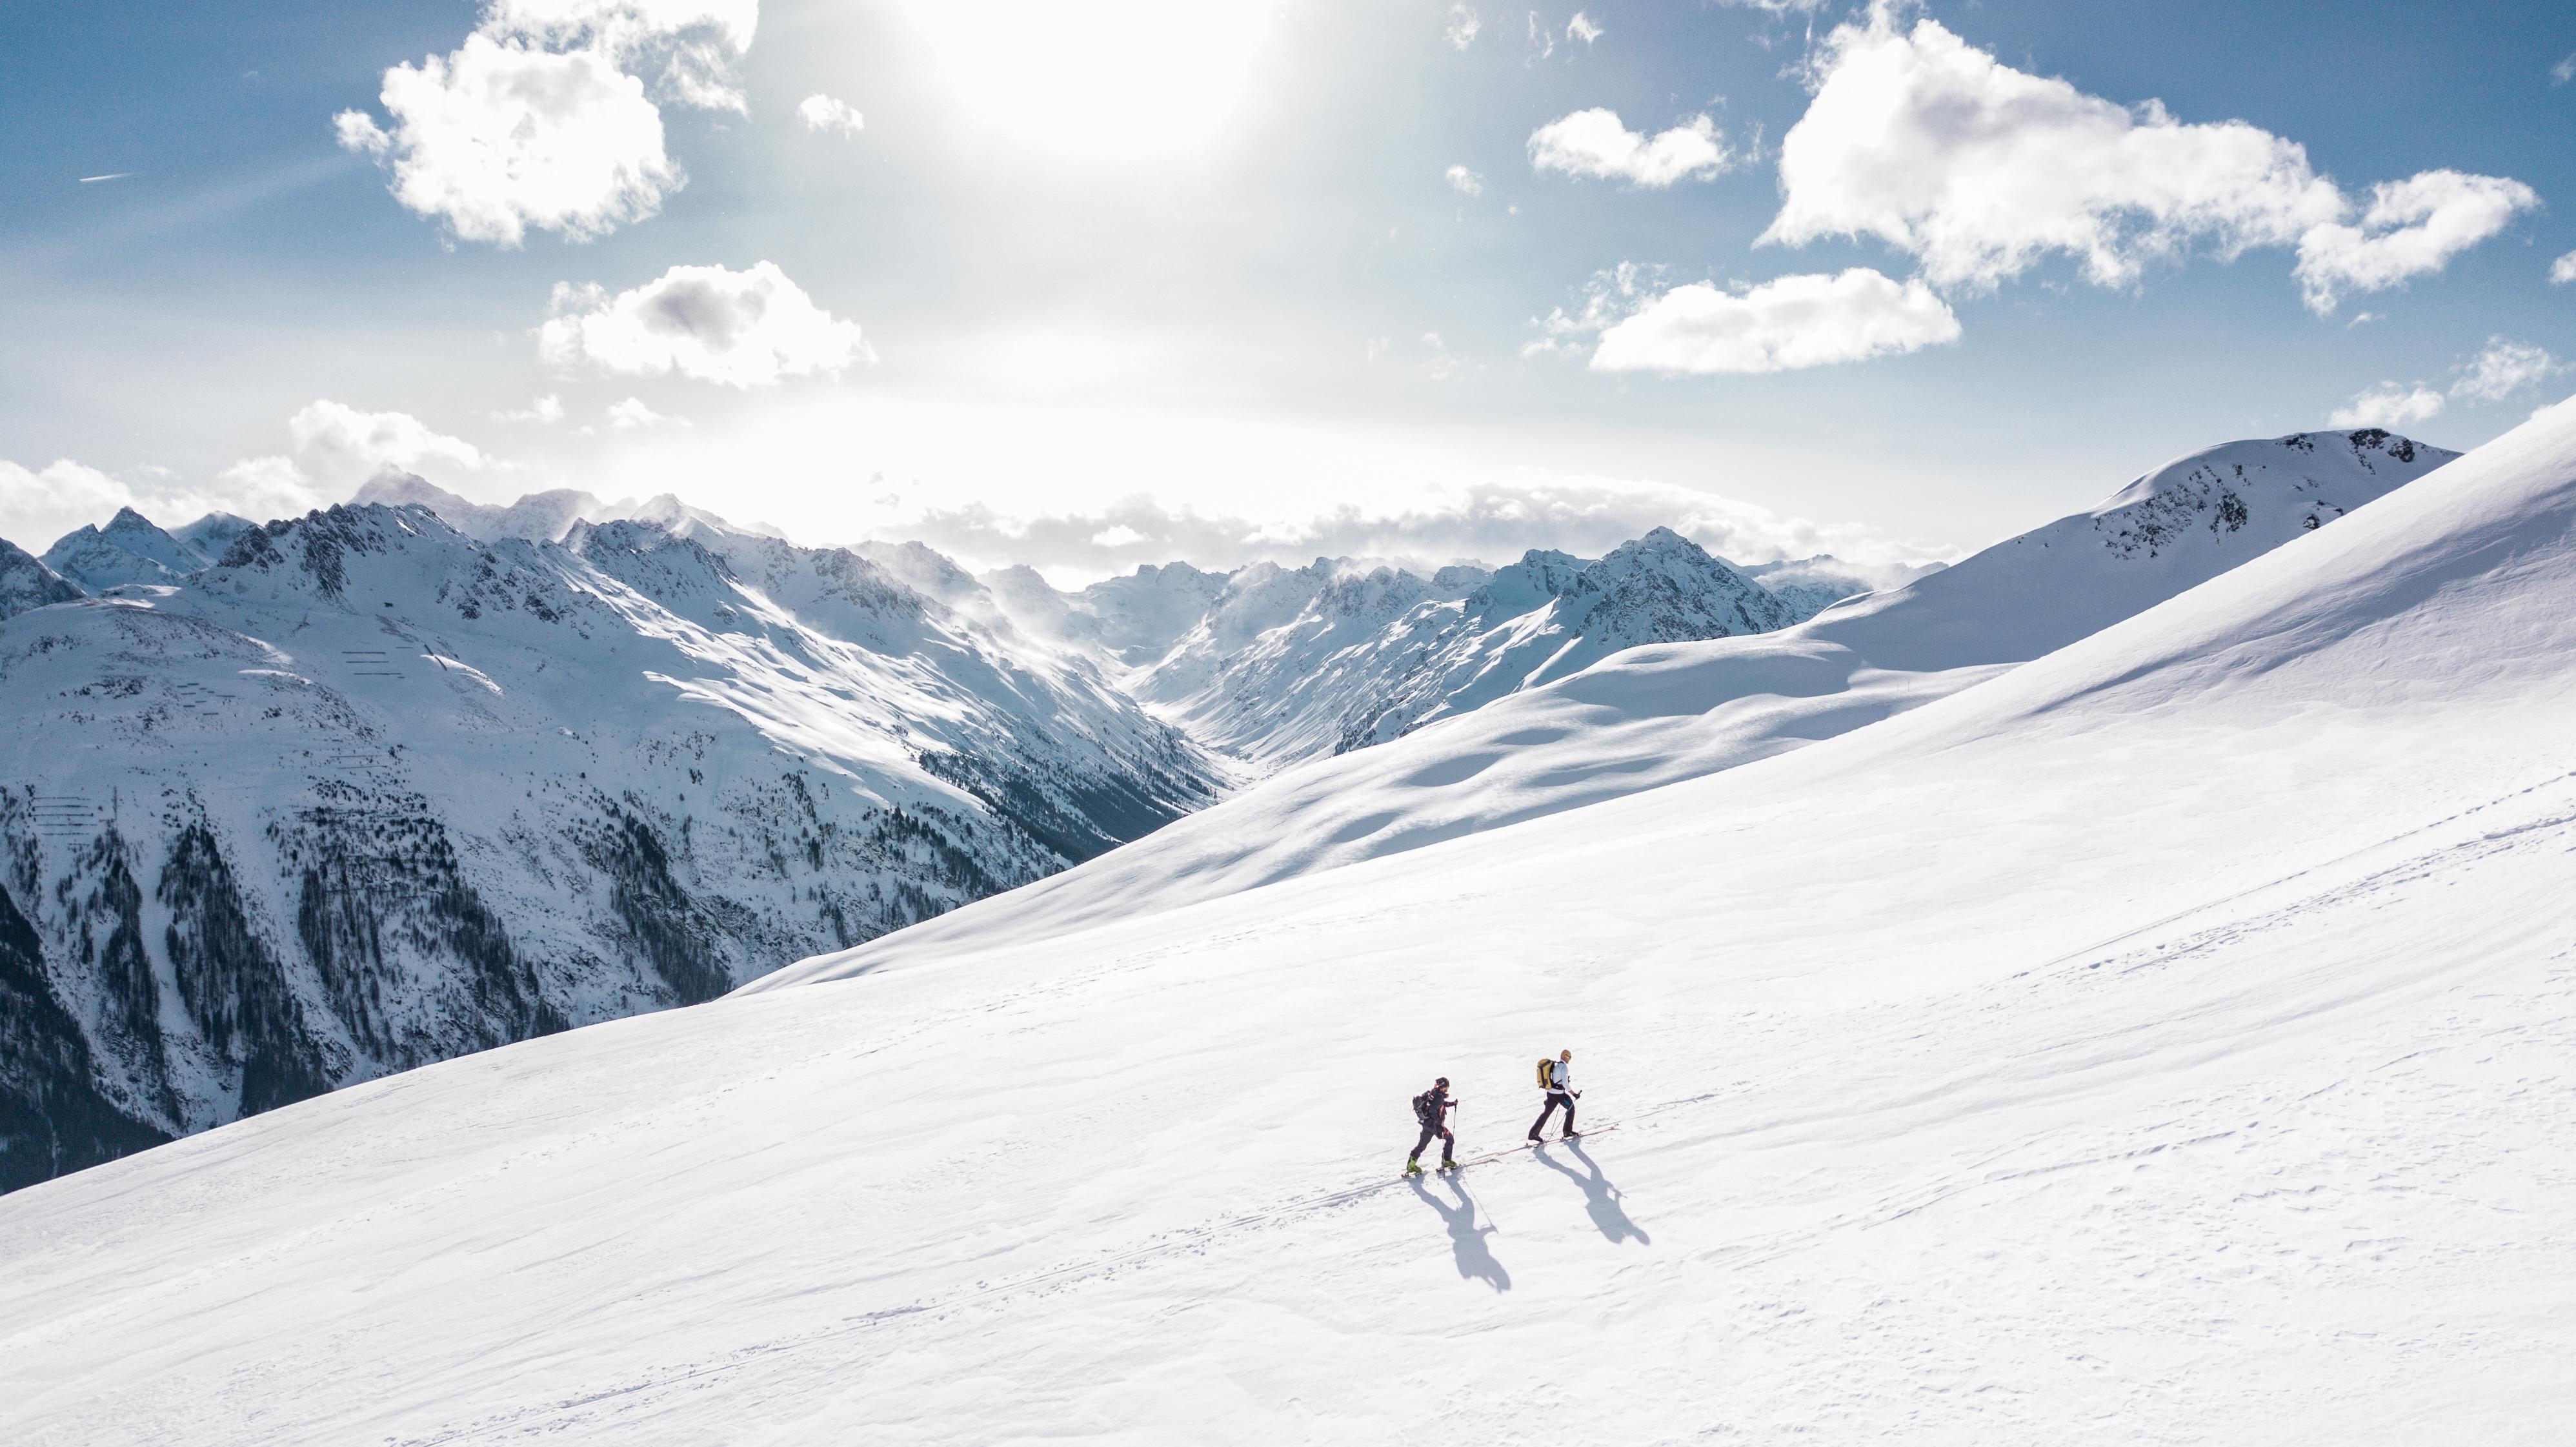 Dune Quote Wallpaper Two Man Hiking On Snow Mountain 183 Free Stock Photo